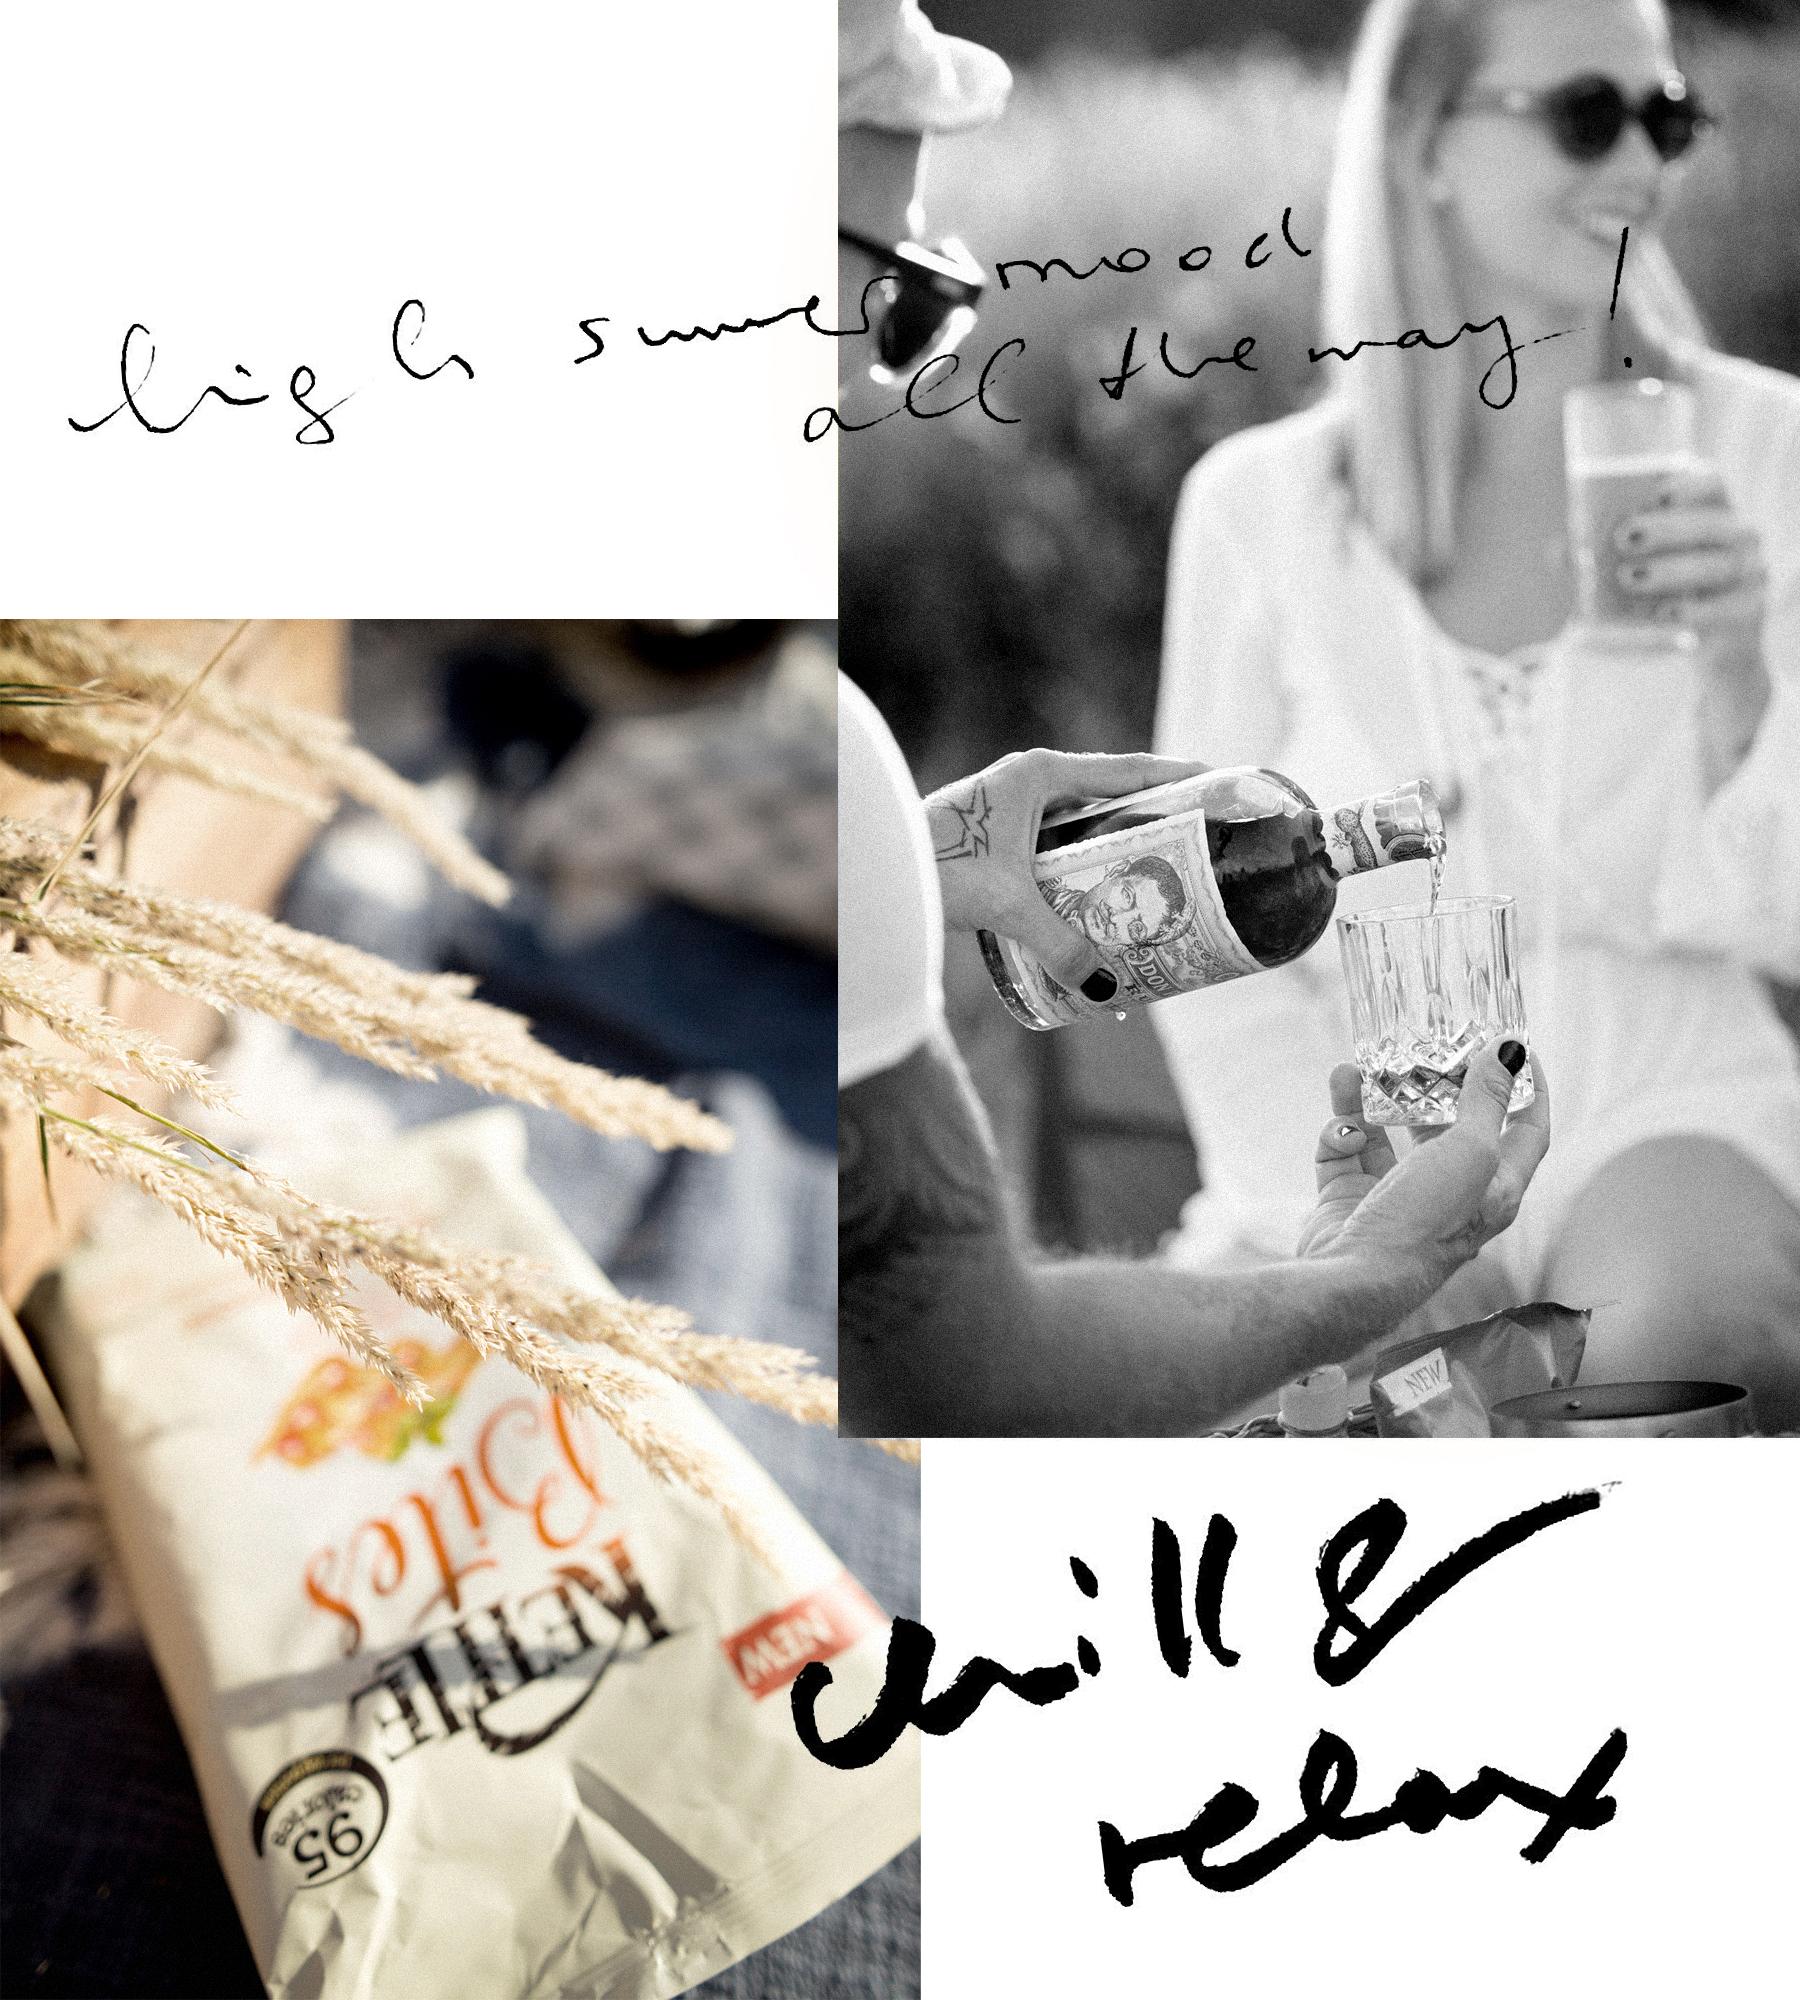 carpe diem kombucha kurkuma picknick summer beach getaway moroccan marokkanisch design style friends chill relax kettle chips food snack lifestyle lifestyleblogger fashionblogger modeblog düsseldorf cats & dogs ricarda schernus max bechmann 2